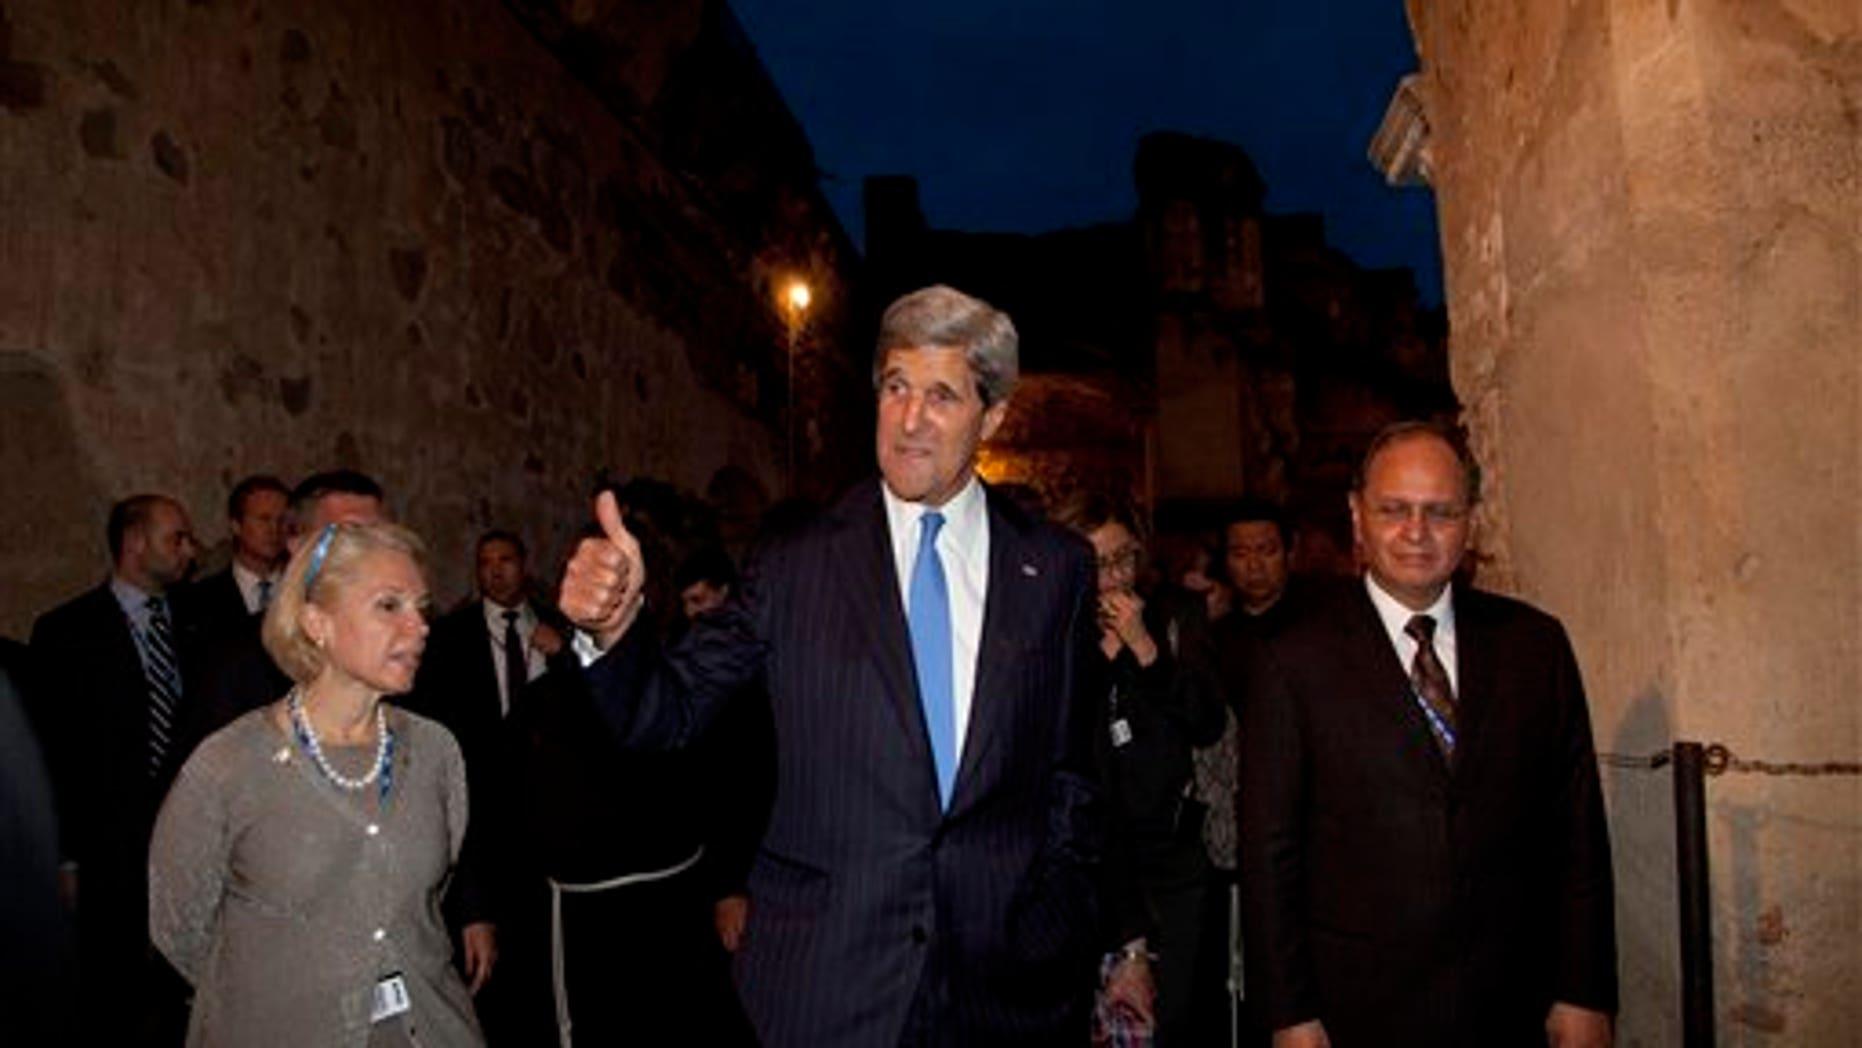 U.S. Secretary of State John Kerry visiting San Francisco Church in Antigua Guatemala, Tuesday, June 4, 2013.